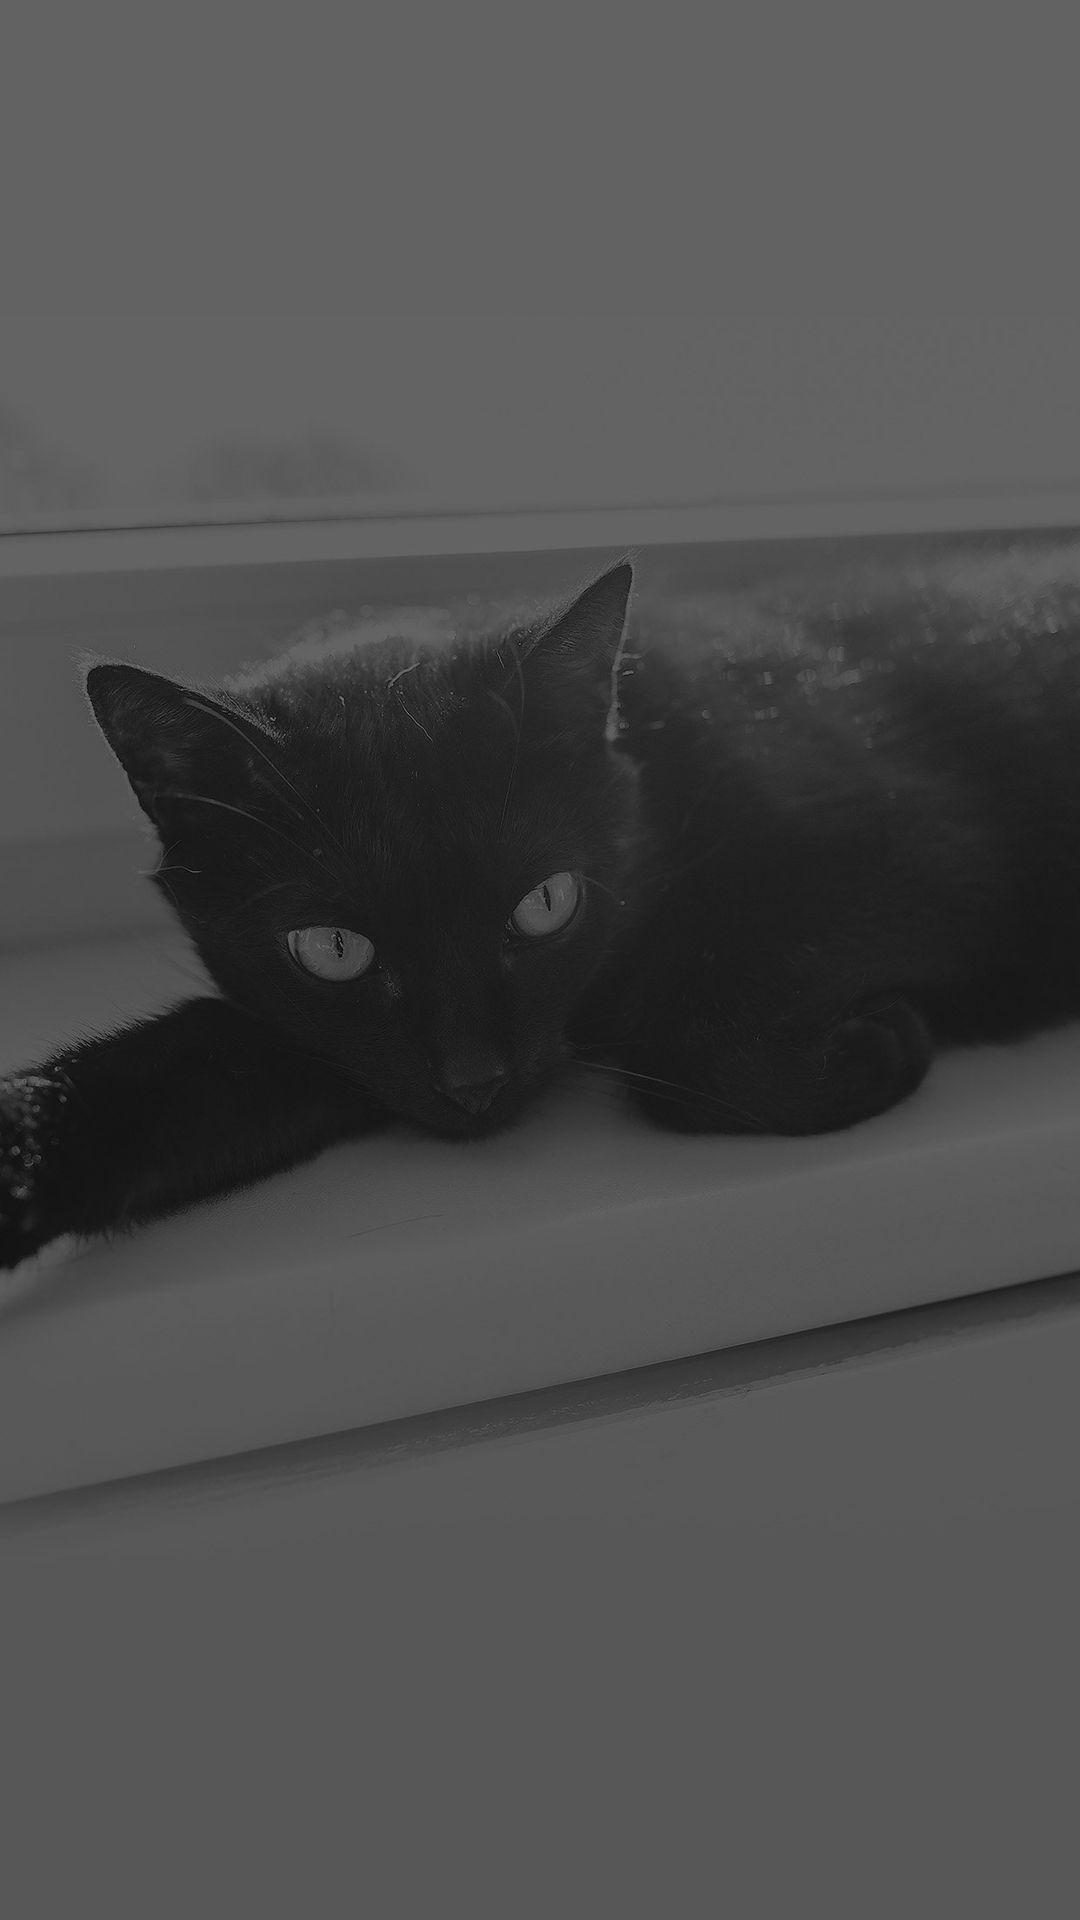 Black Cat Animal Cute Watching Dark Bw iPhone 6 wallpaper